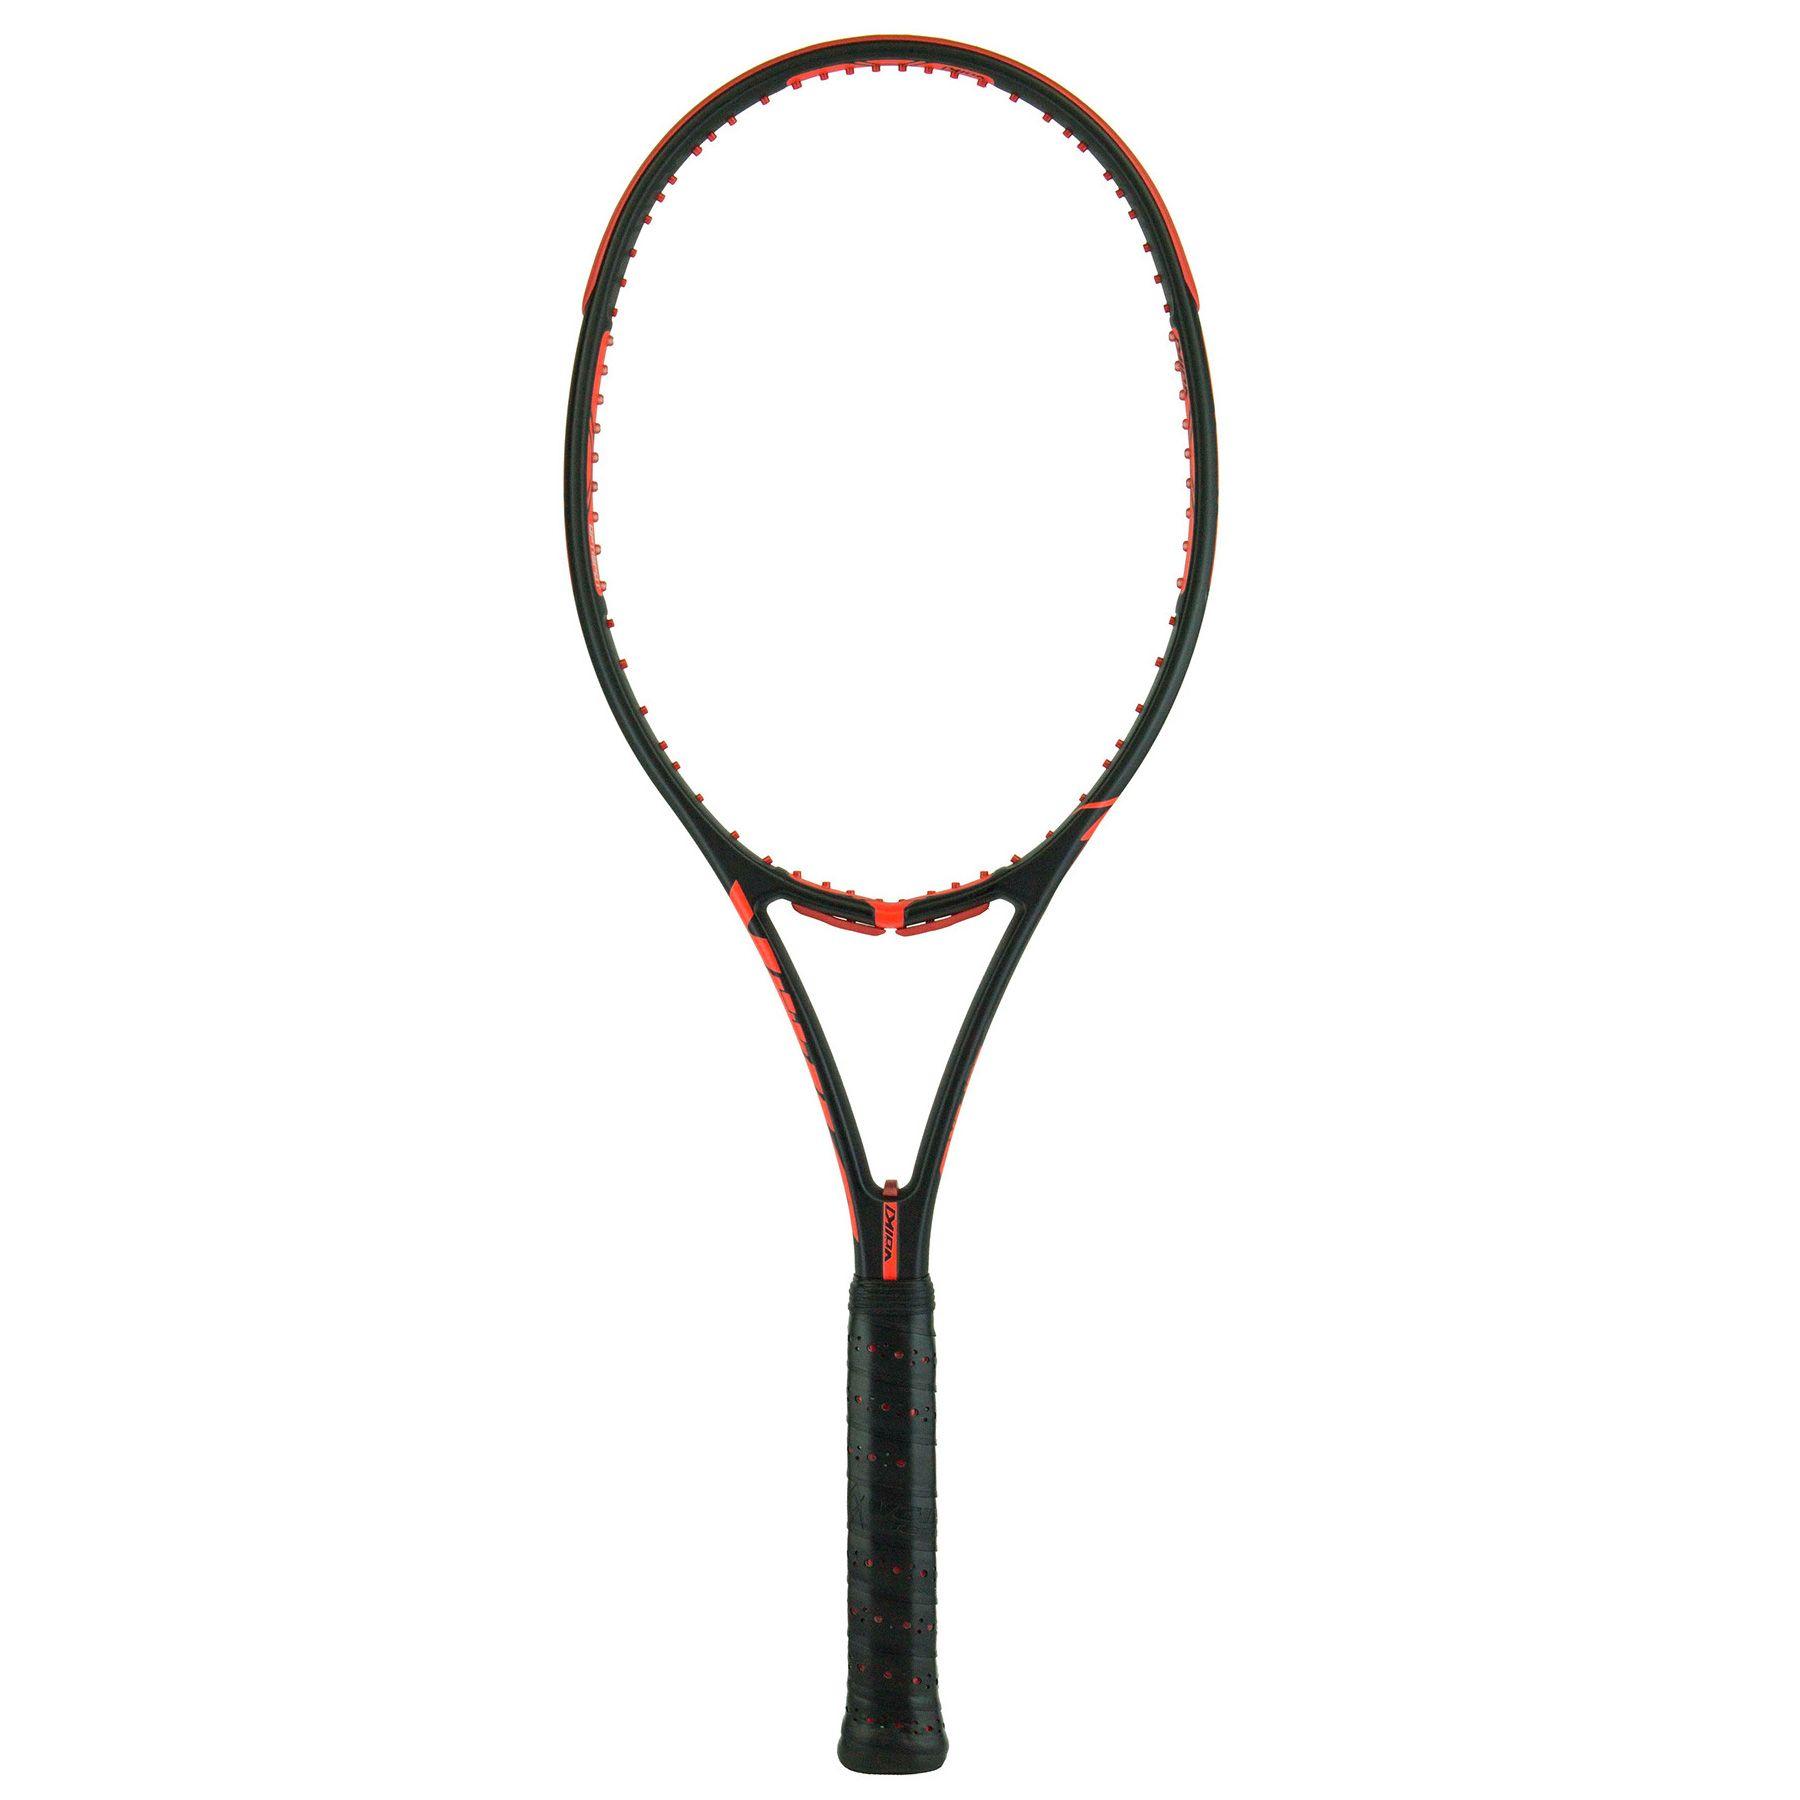 Volkl Super G 10 Mid 320g Tennis Racket